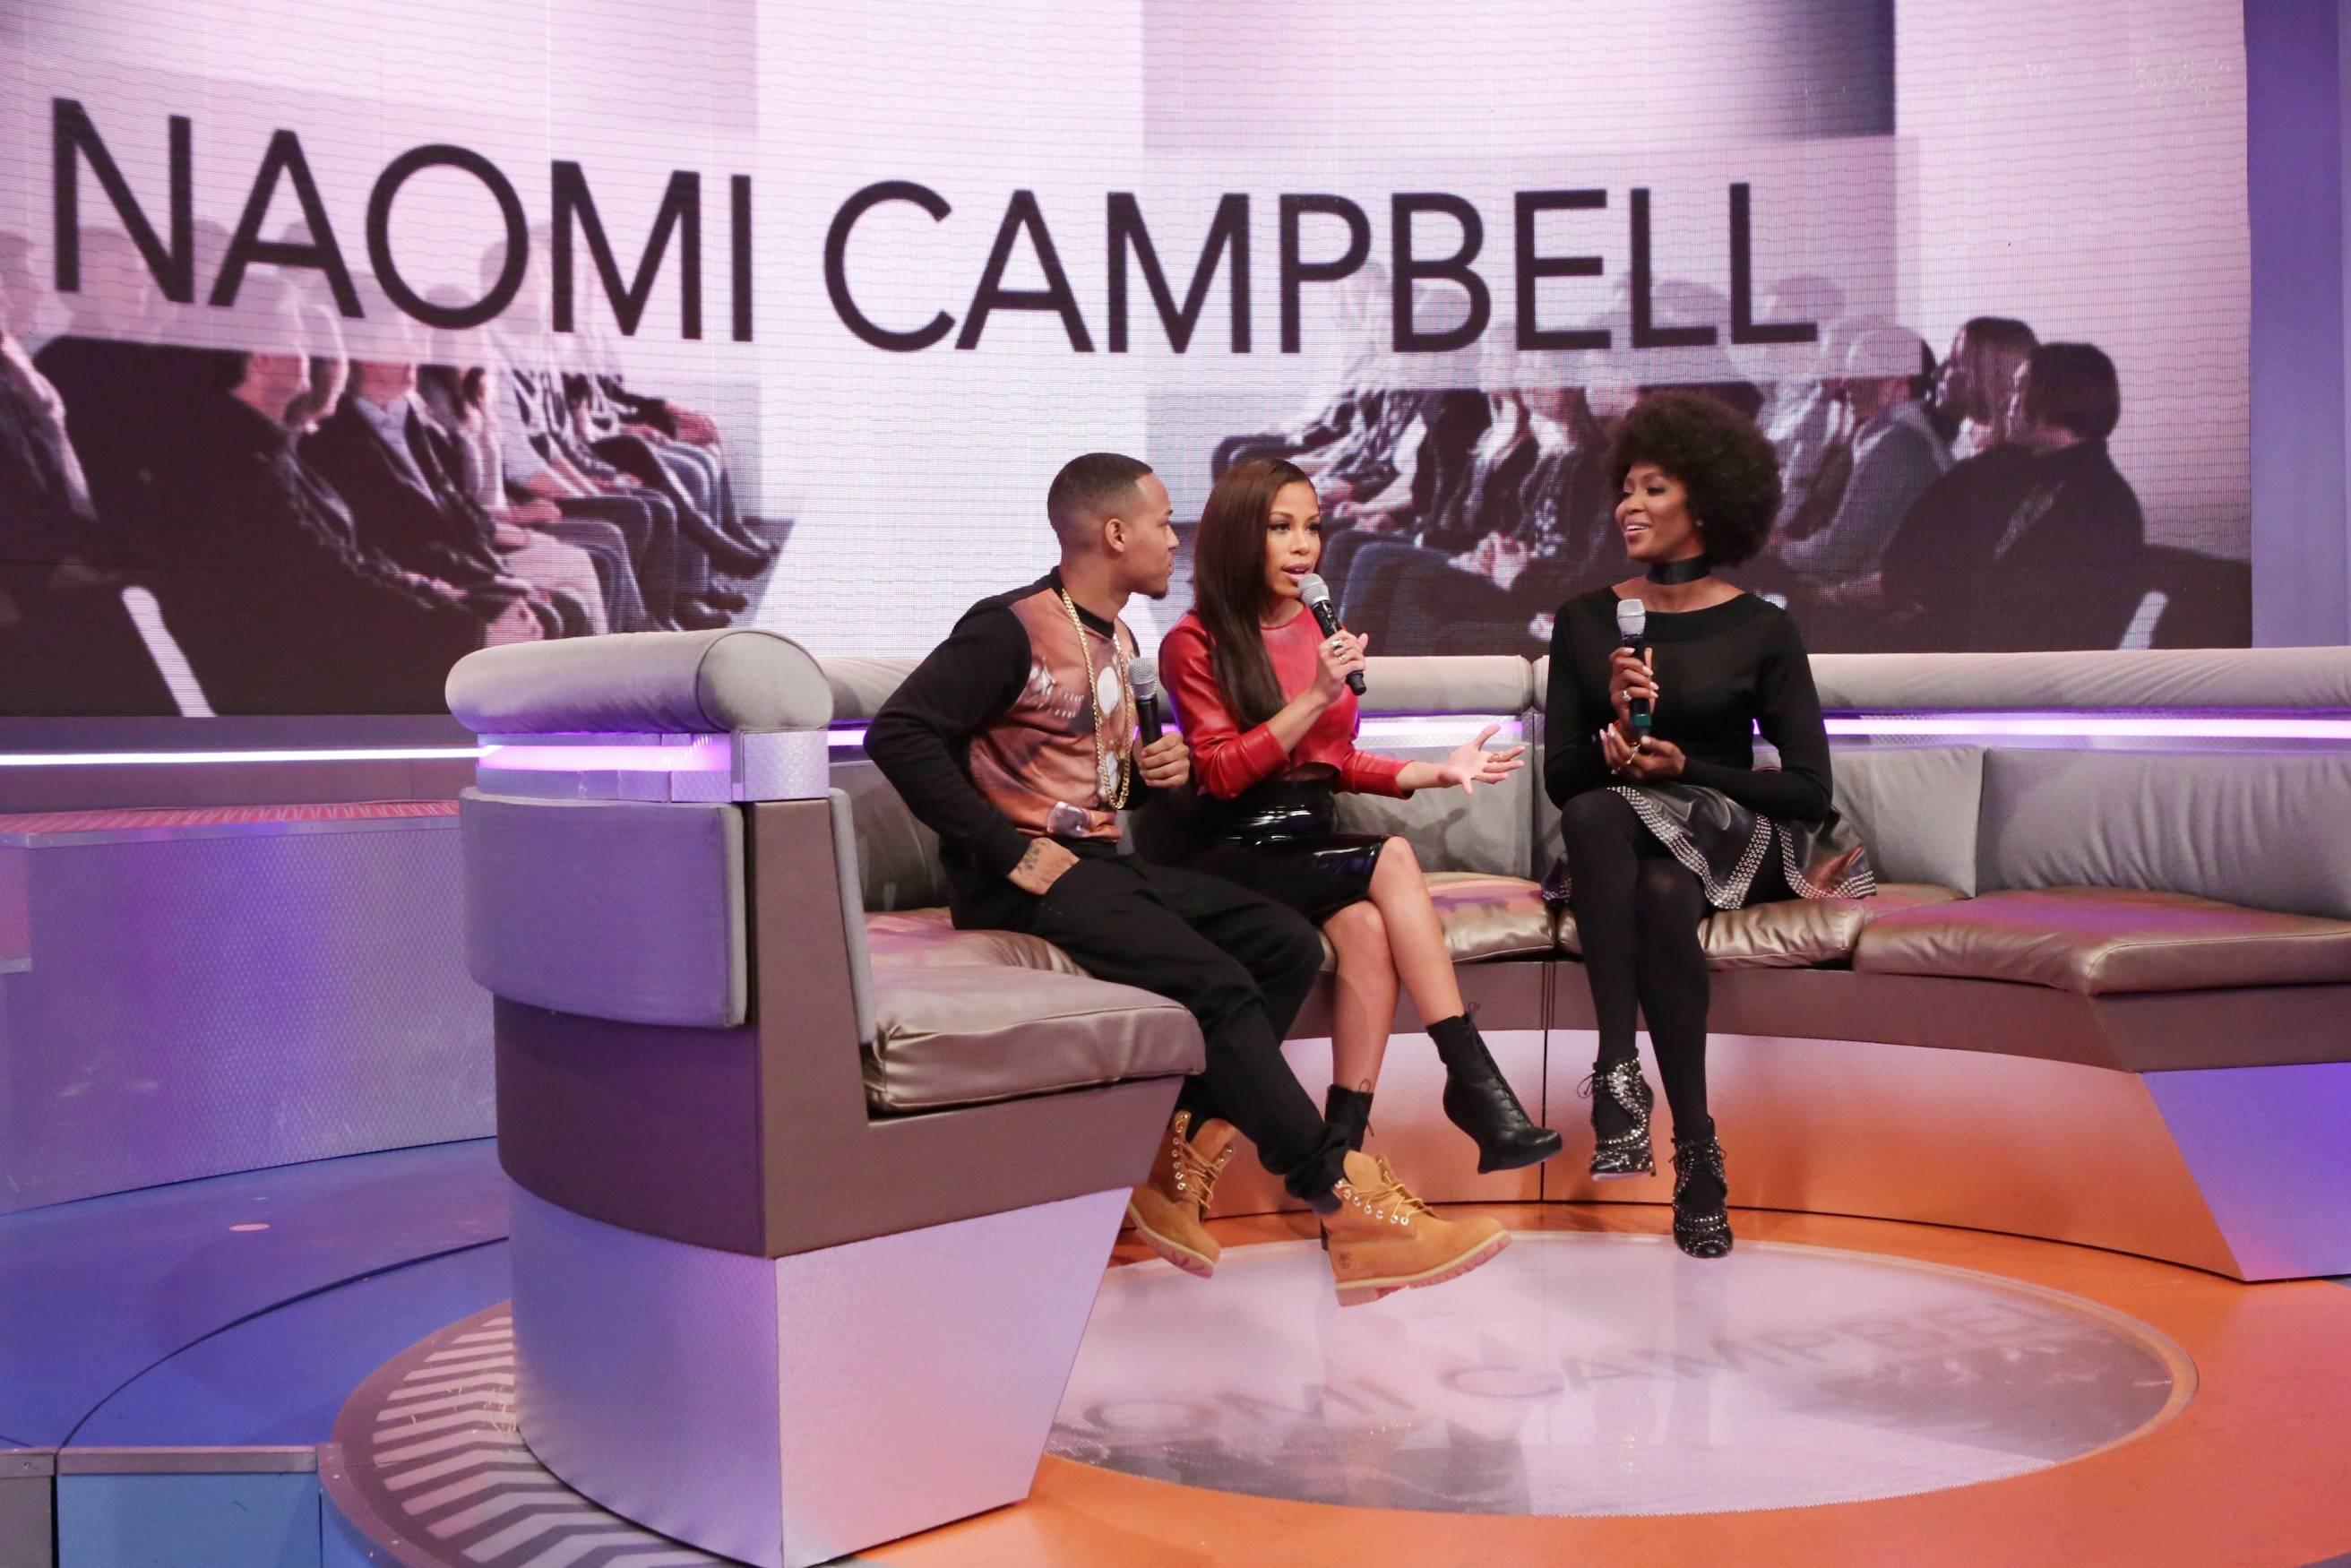 Miss Naomi Campbell - (Photo: Bennett Raglin/BET/Getty Images)